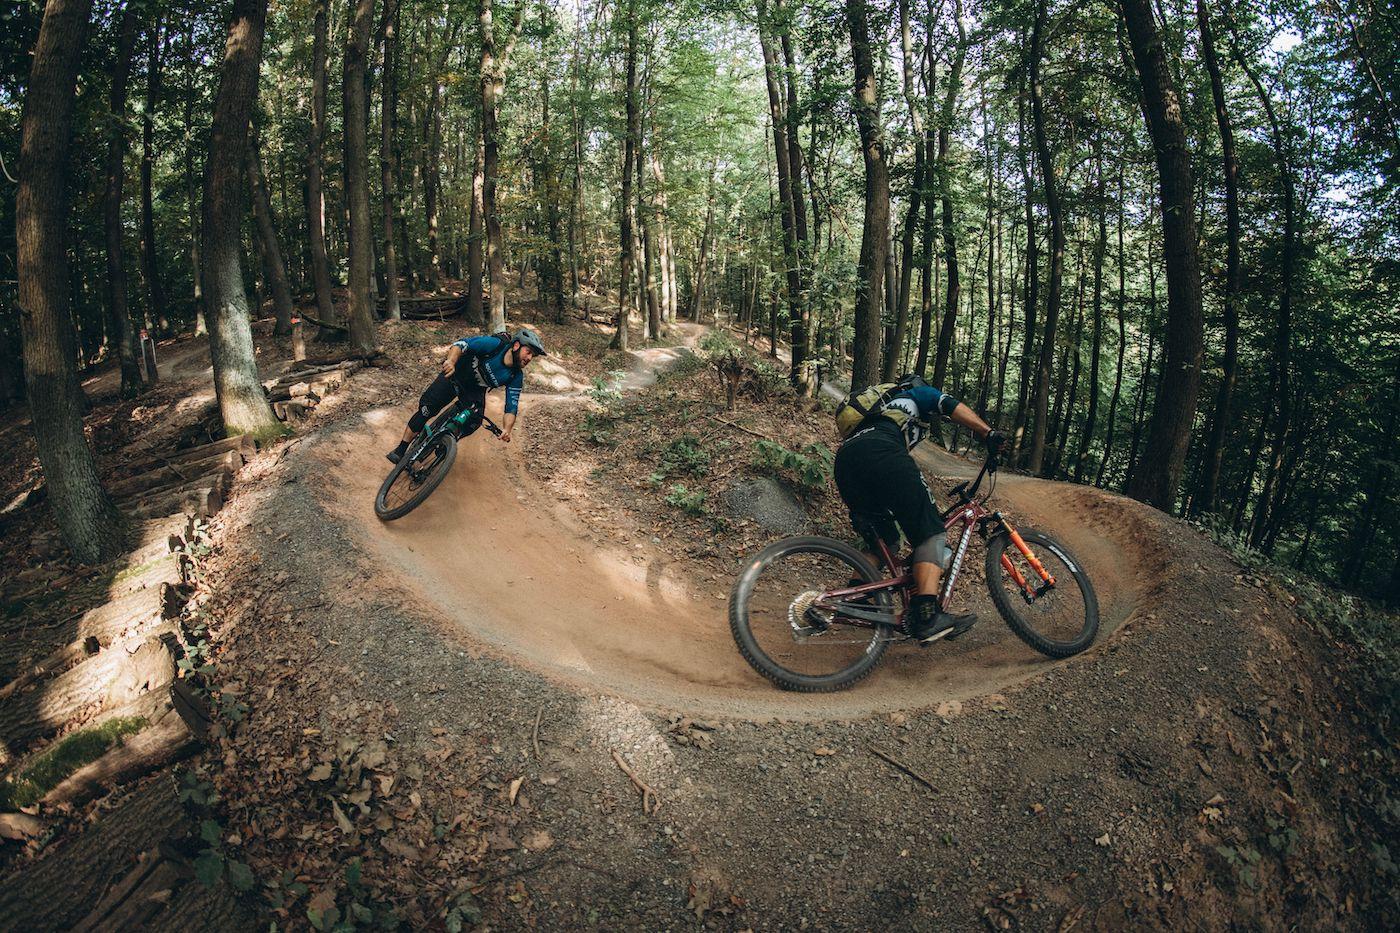 Experten Fahrtechnik Kurs in Nürnberg - Rock my Trail MTB und eBike Bikeschule-7